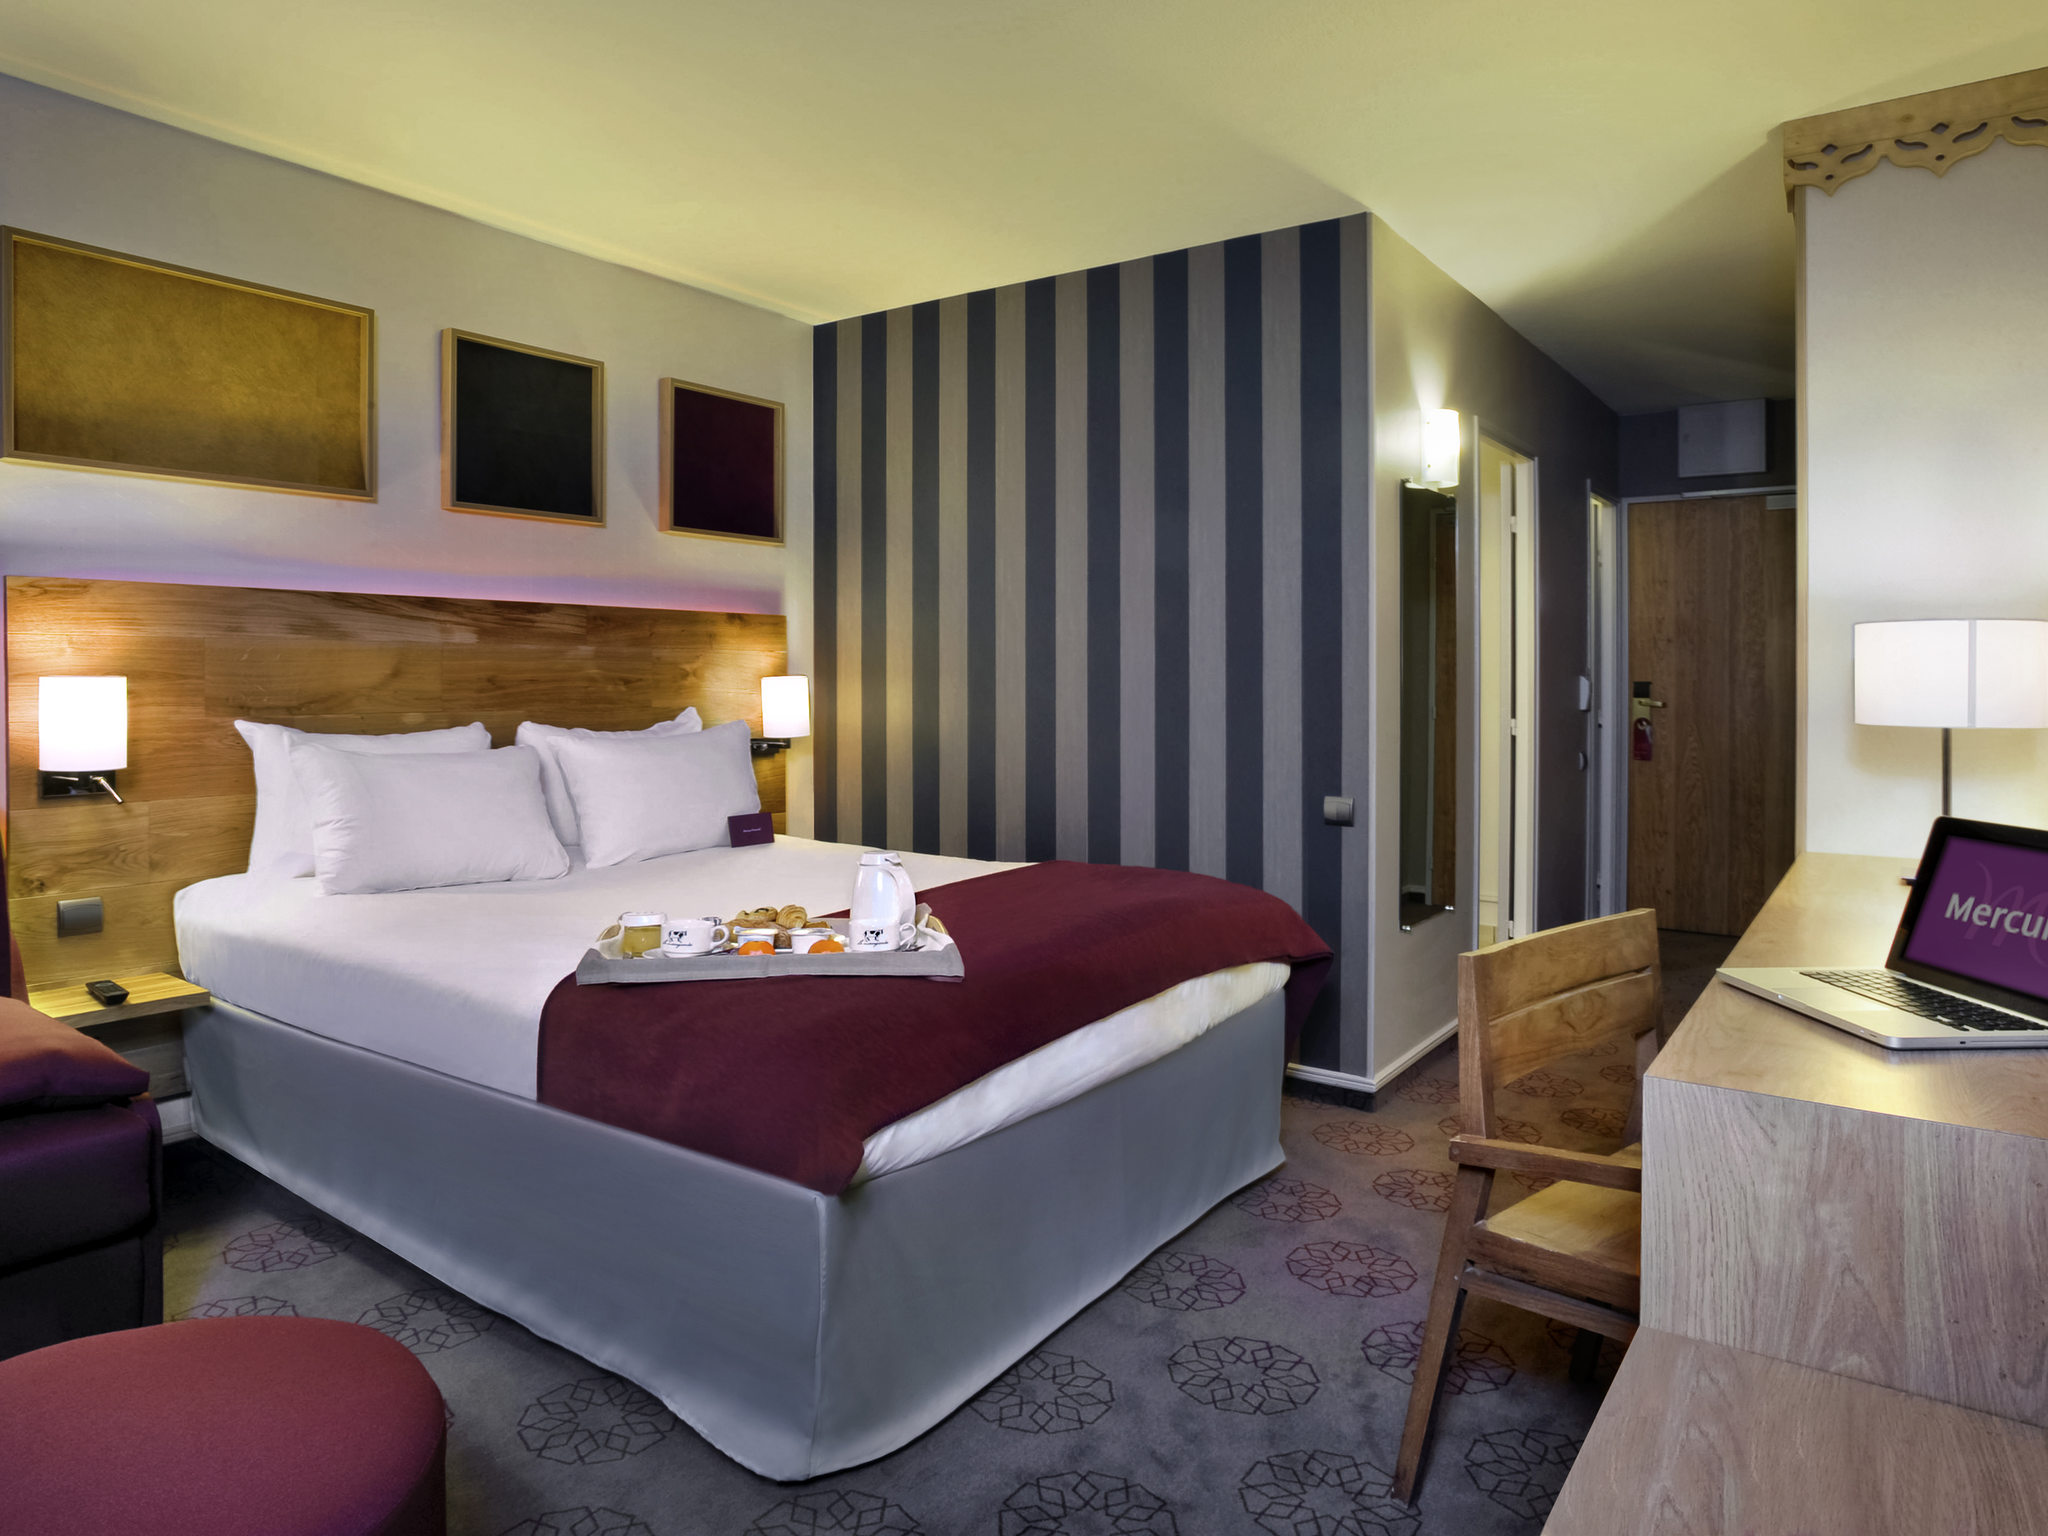 Hotel – Albergo Mercure Saint Lary Sensoria